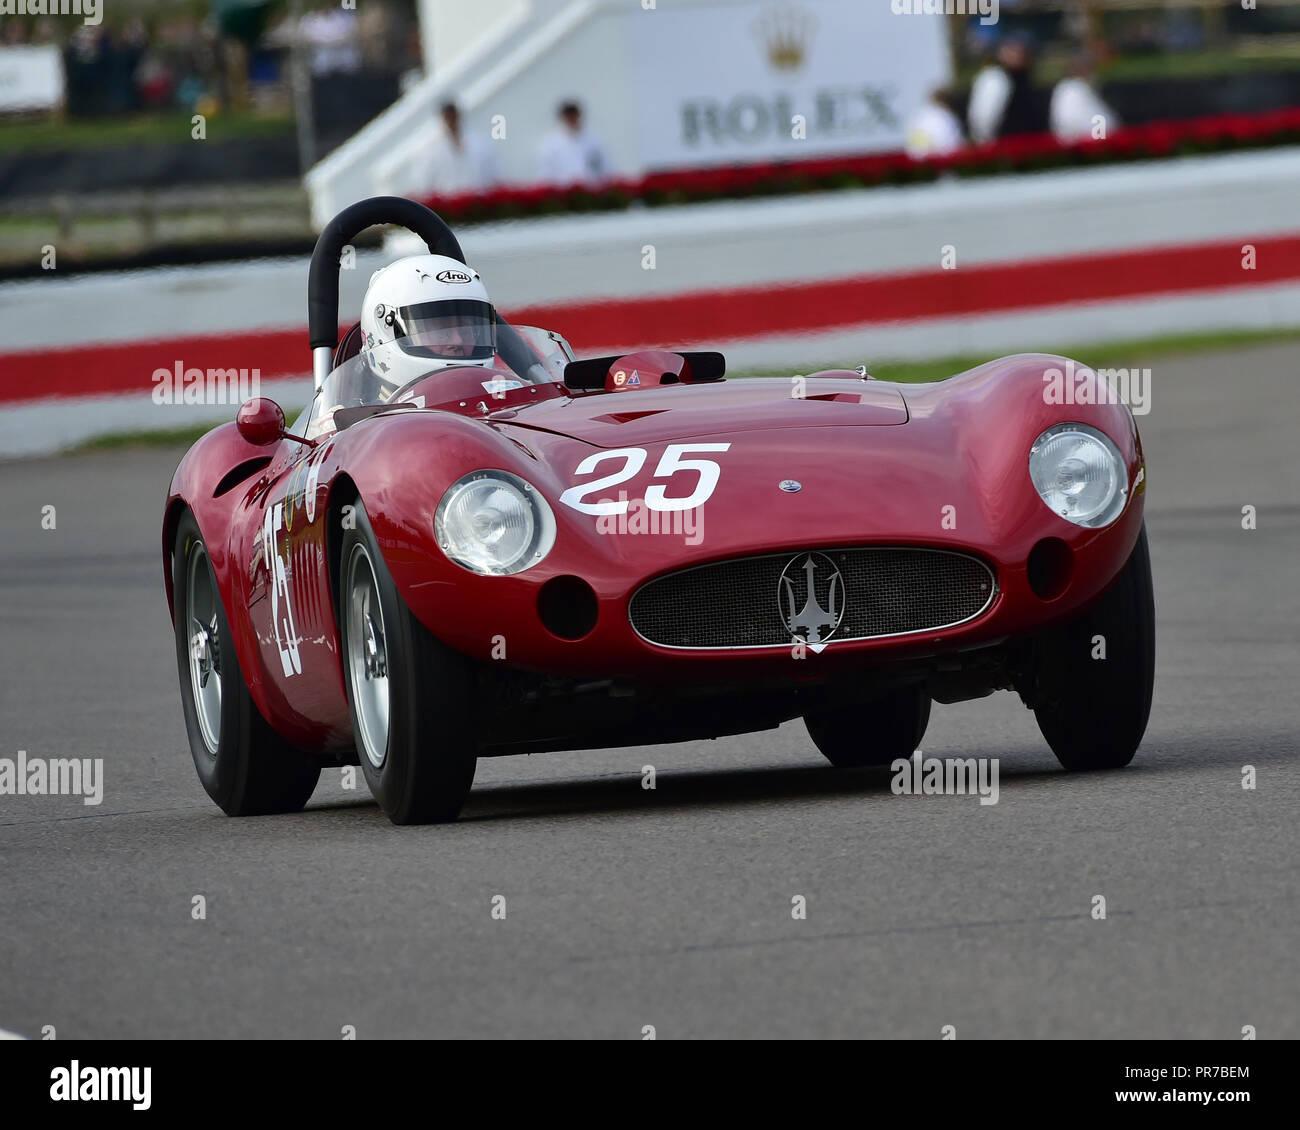 Conrad Ulrich, Maserati 300S, Freddie März Memorial Trophy, Sportwagen, 1952 bis 1955, Goodwood Revival 2018, September 2018, Automobile, Autos, Circ. Stockbild